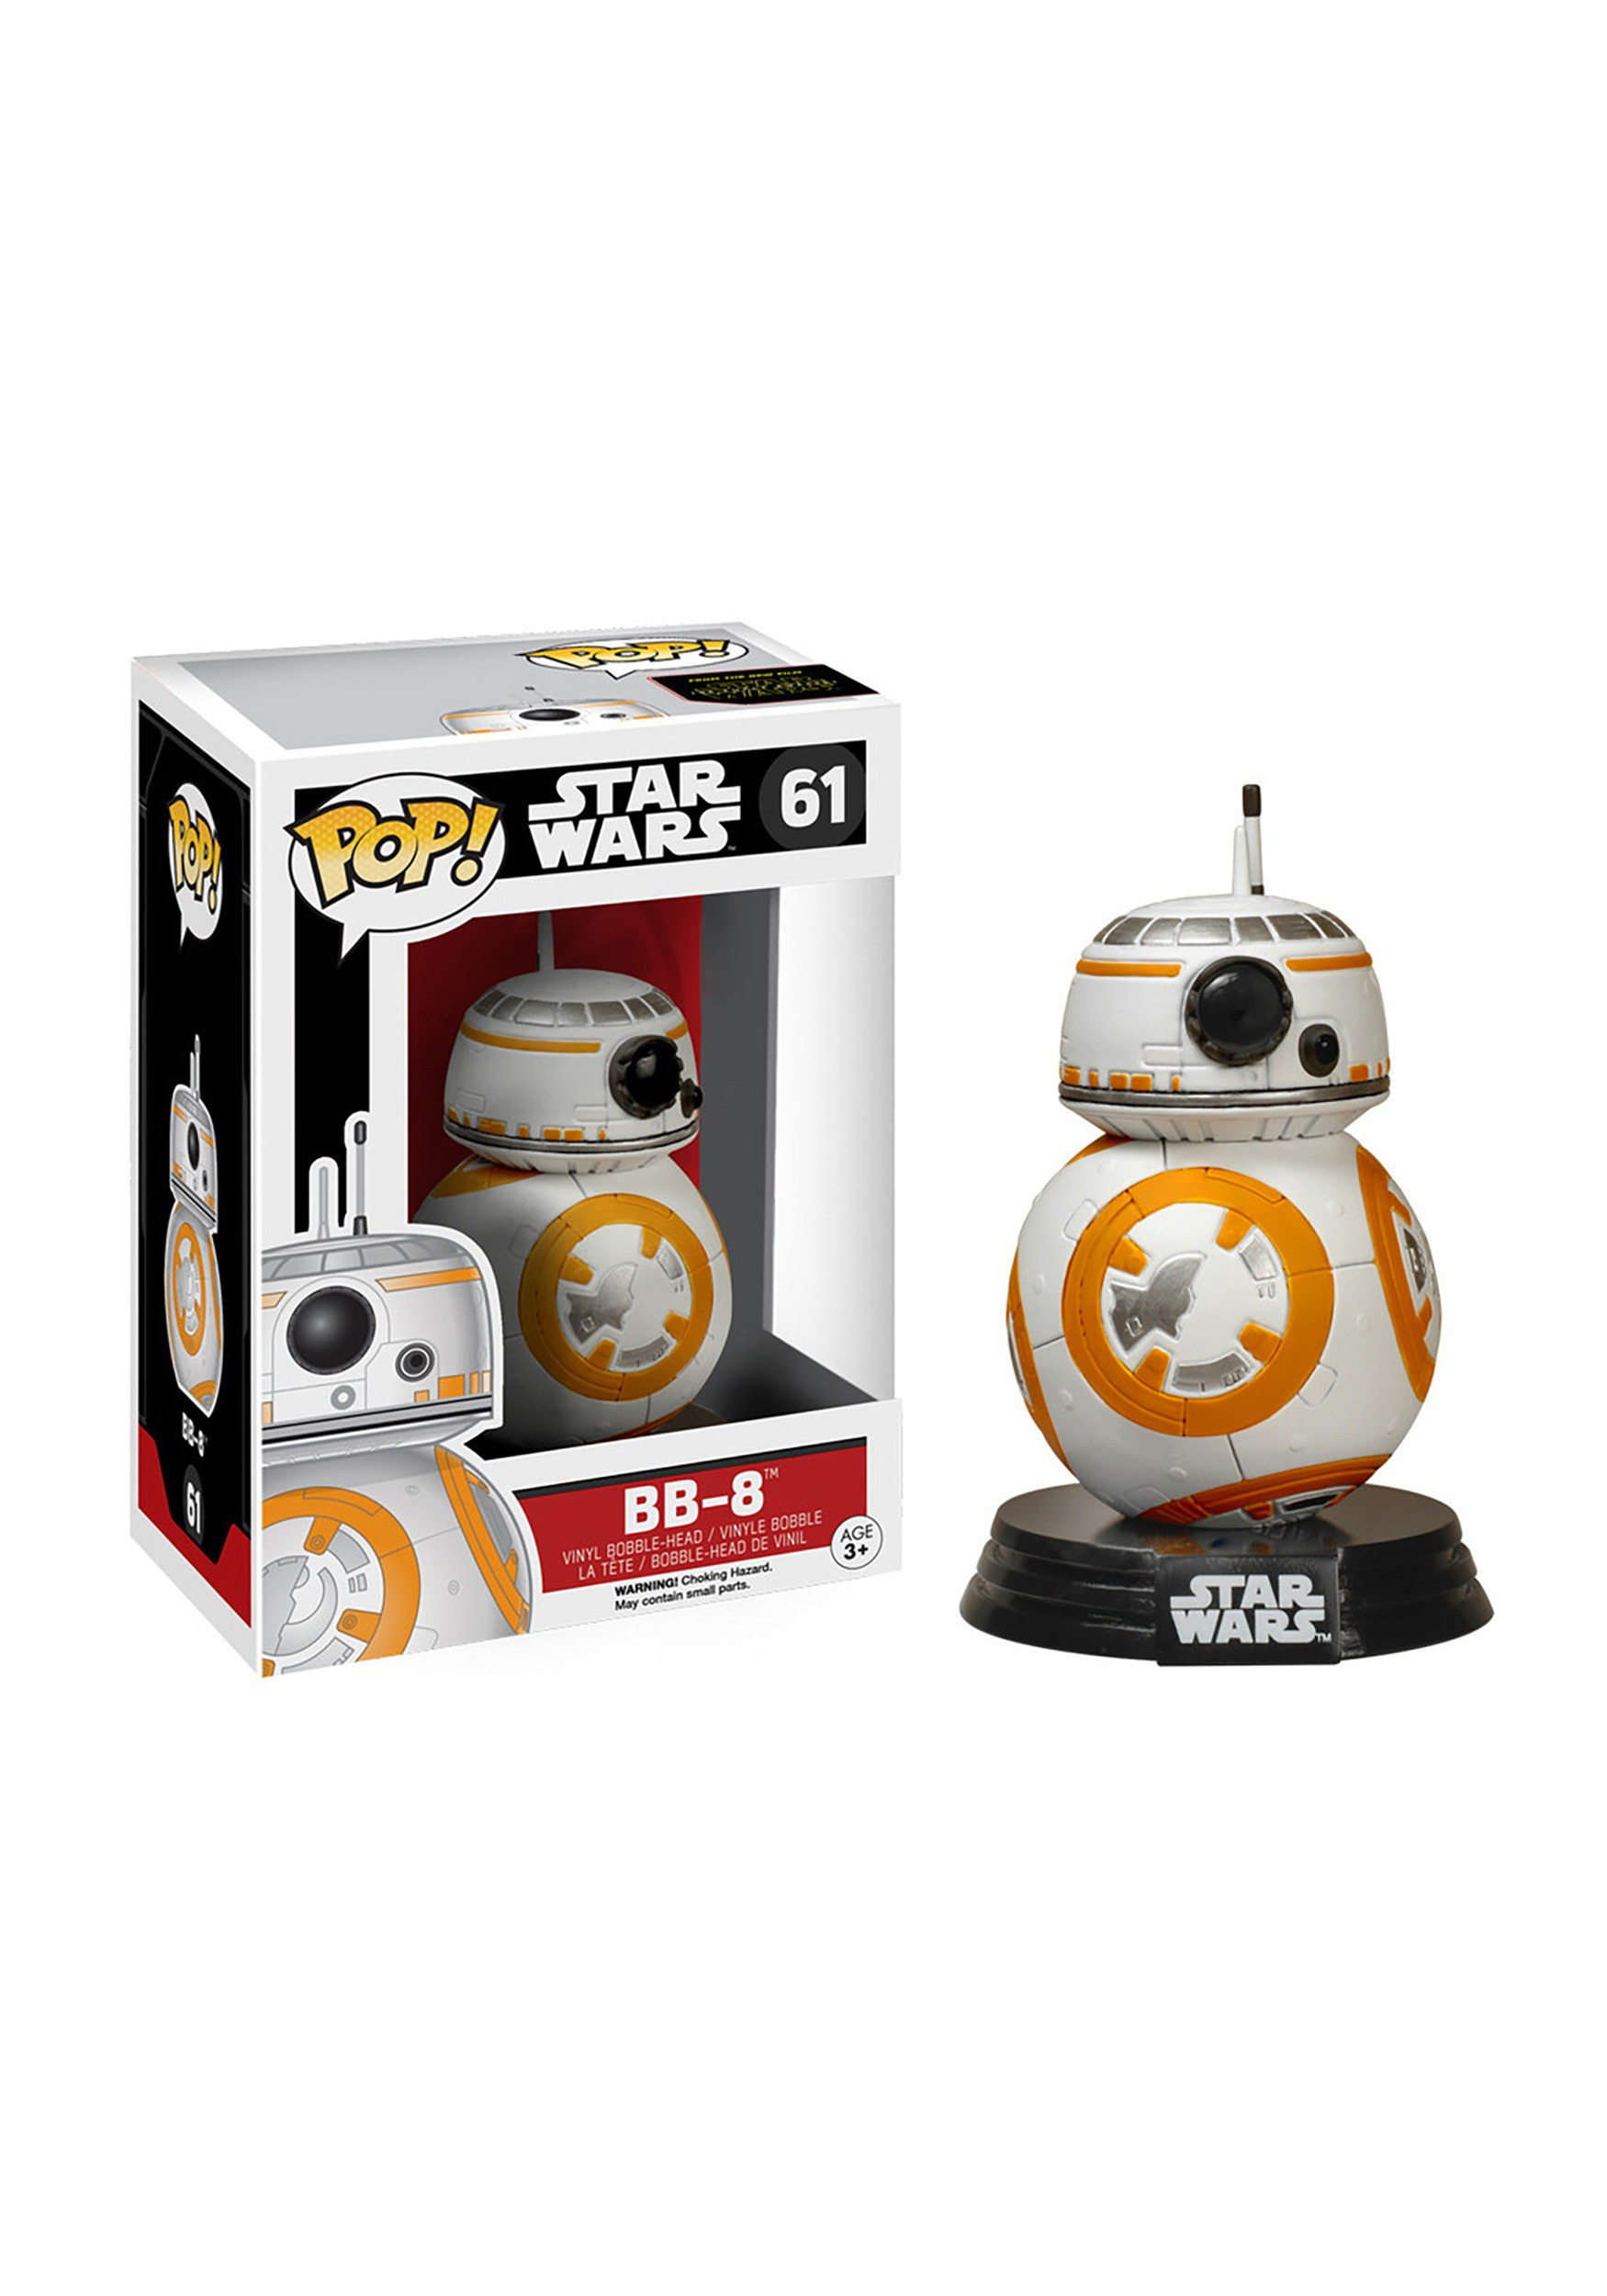 POP! Star Wars The Force Awakens BB8 Bobblehead Figure FN6218